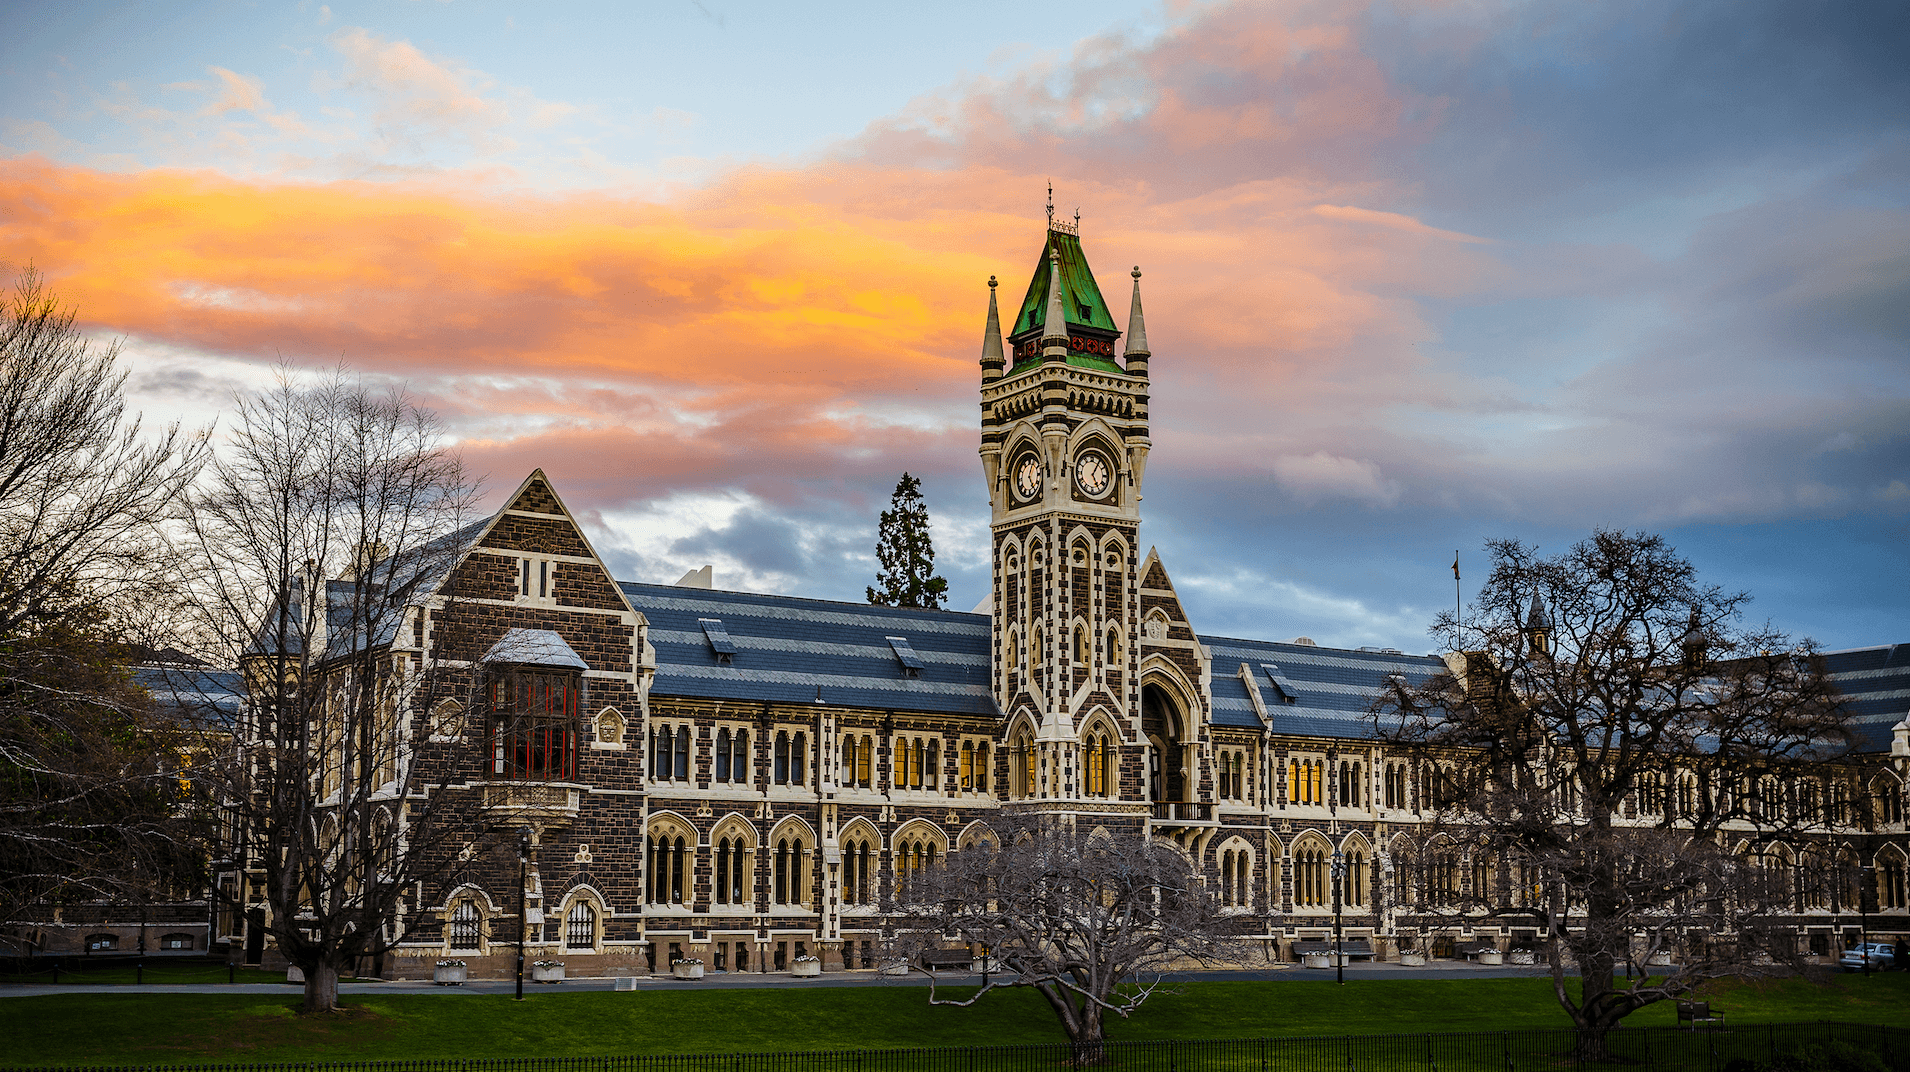 Otago Medview